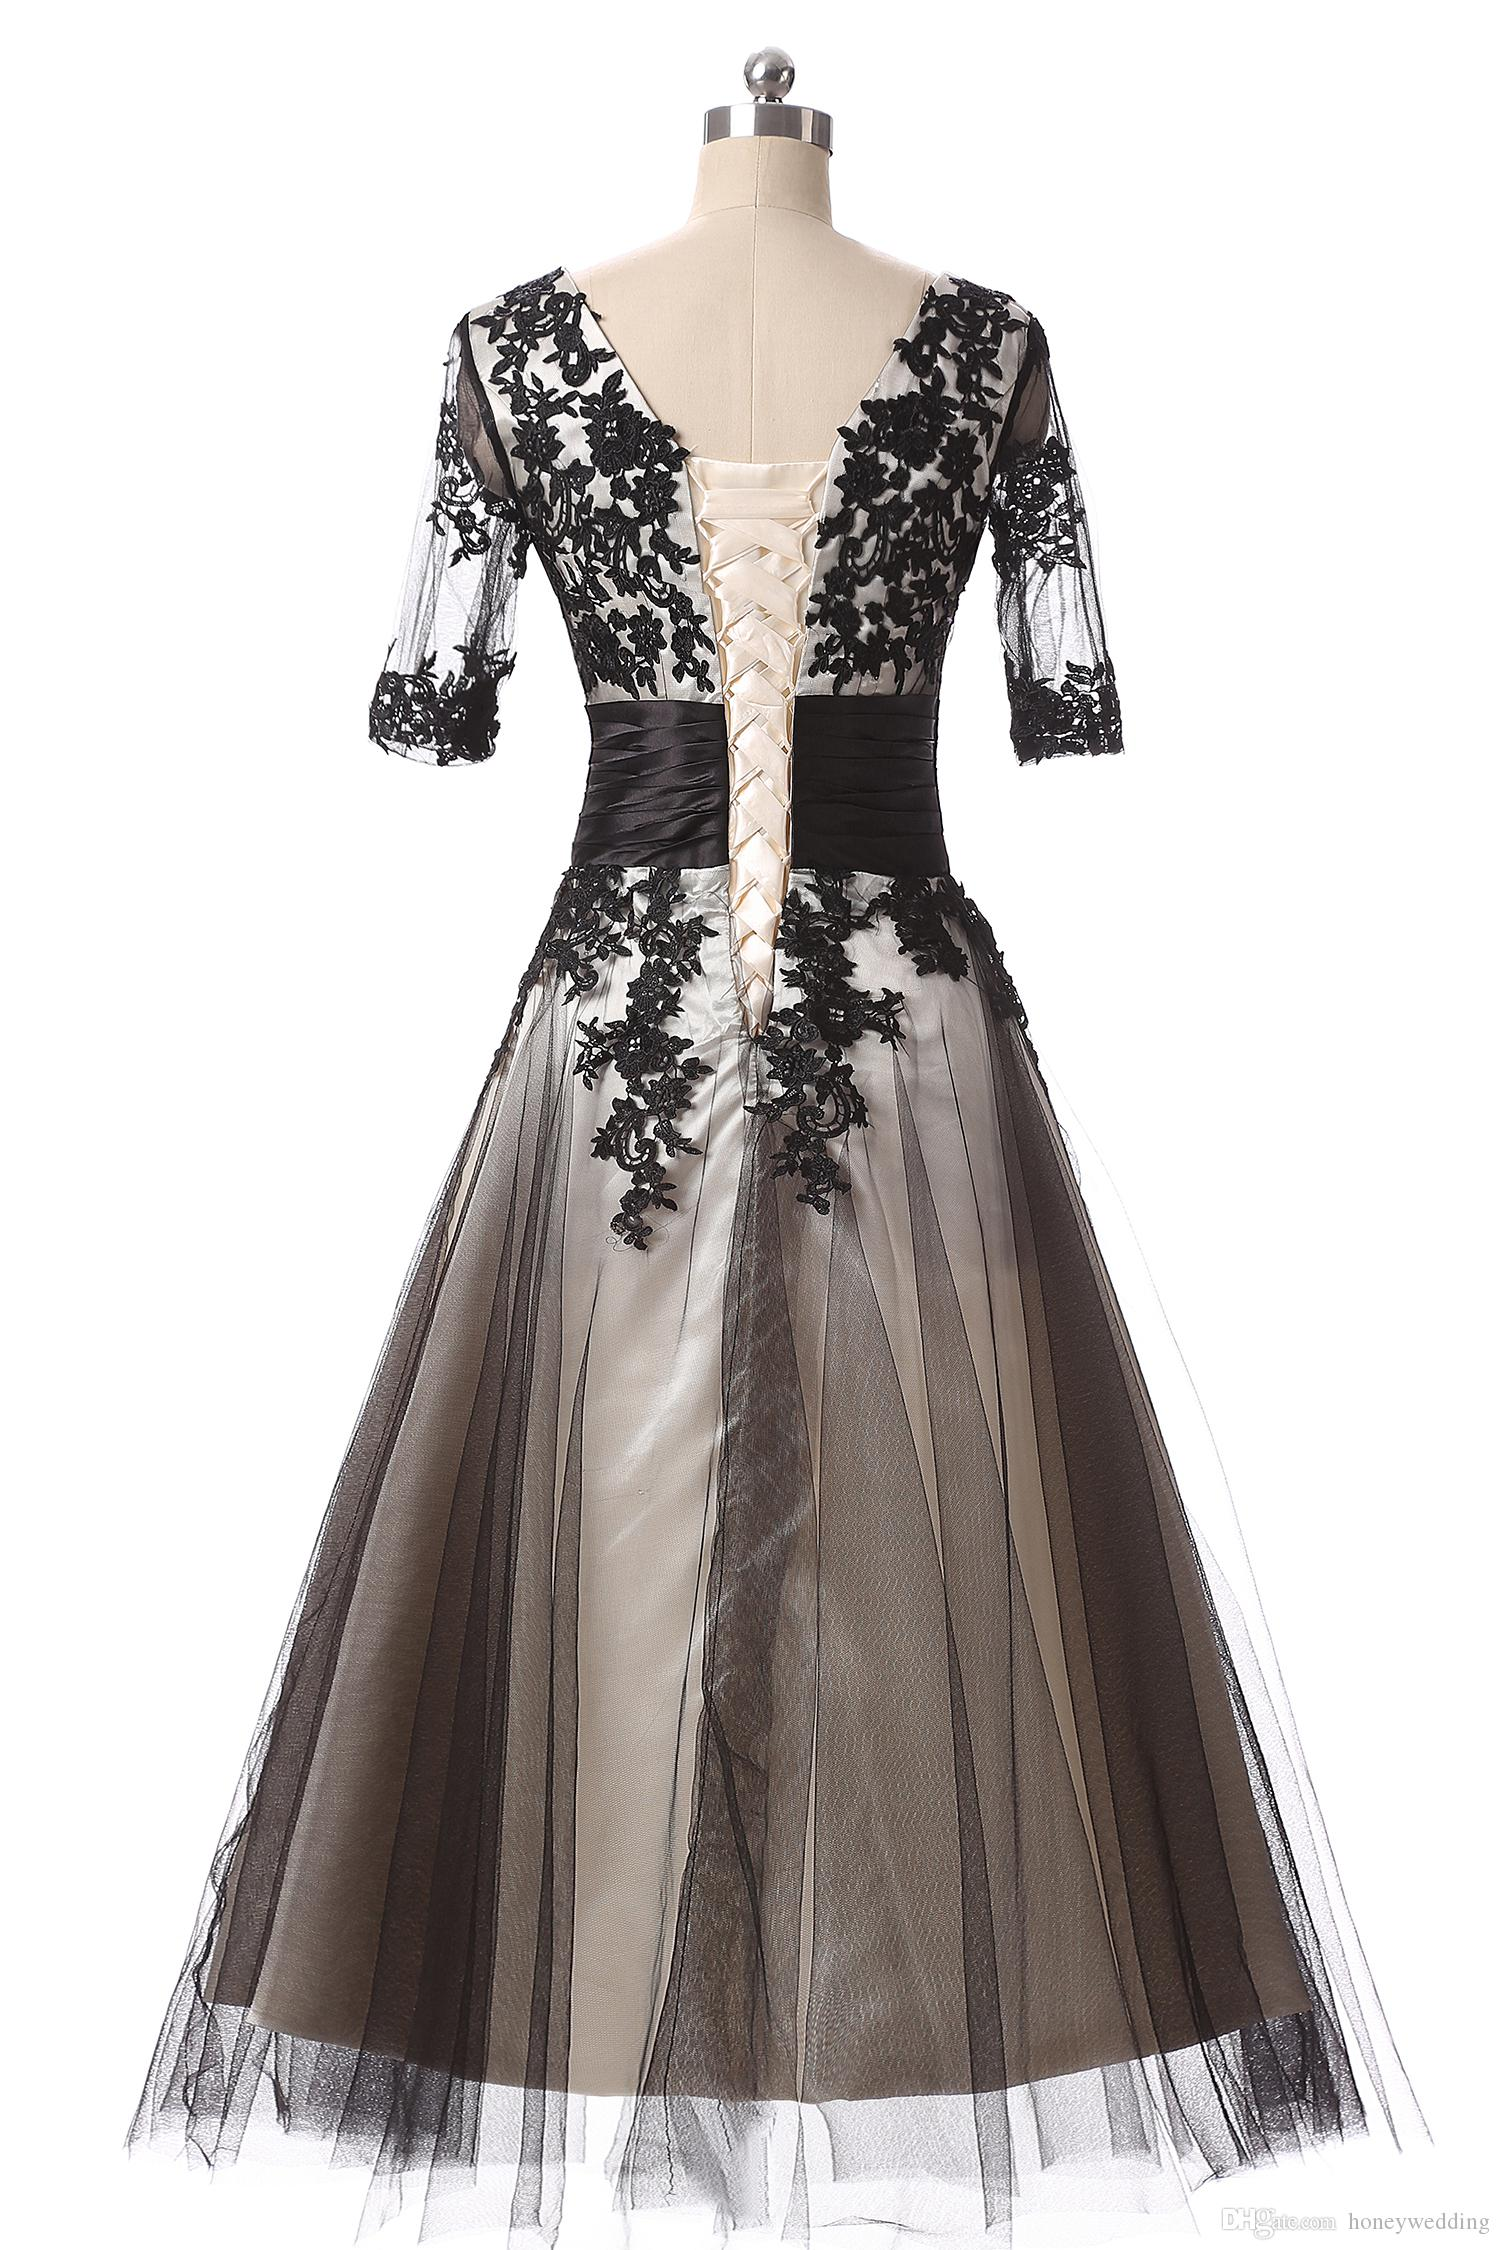 Vestidos curtos de baile barato 2017 meia mangas de renda apliques de chá de comprimento Cocktail Party Dress Champagne Champagne Ocasião Formal vestido Vestidos